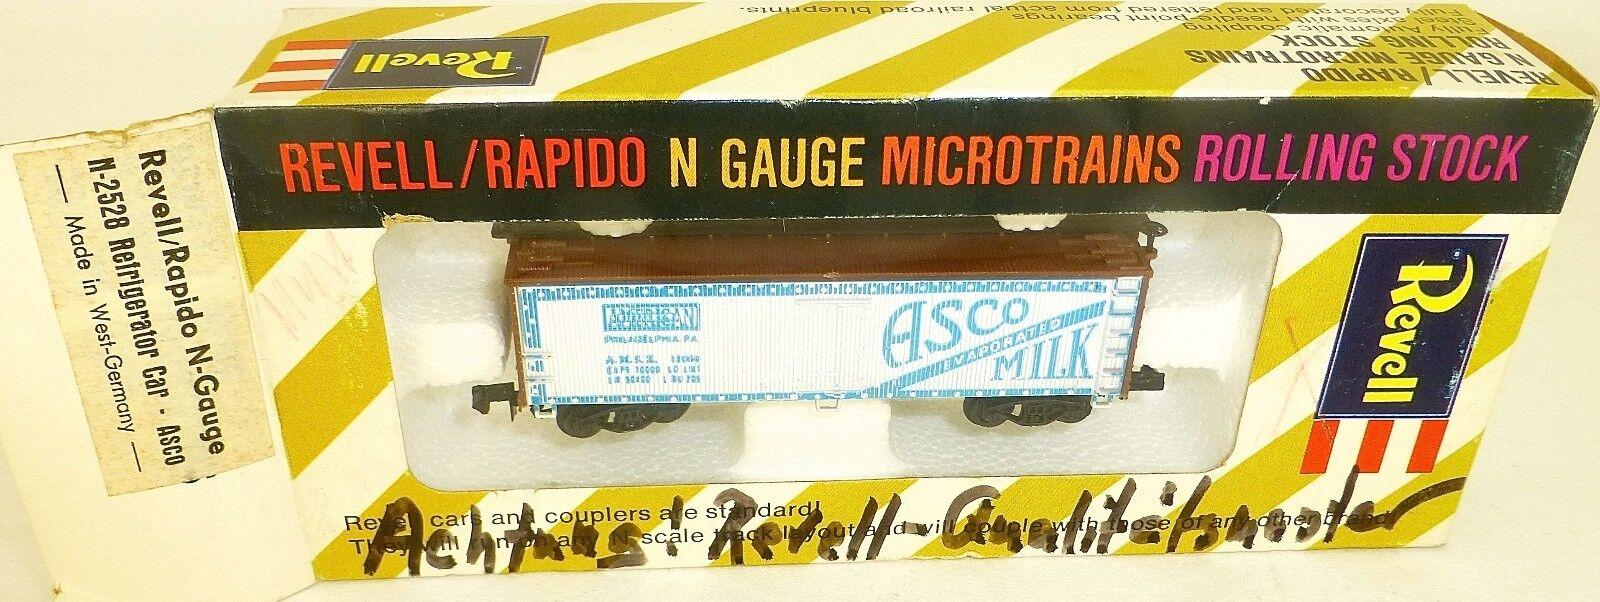 ASCO refrigerator car qual. muster revell rapido micro trains n-2528